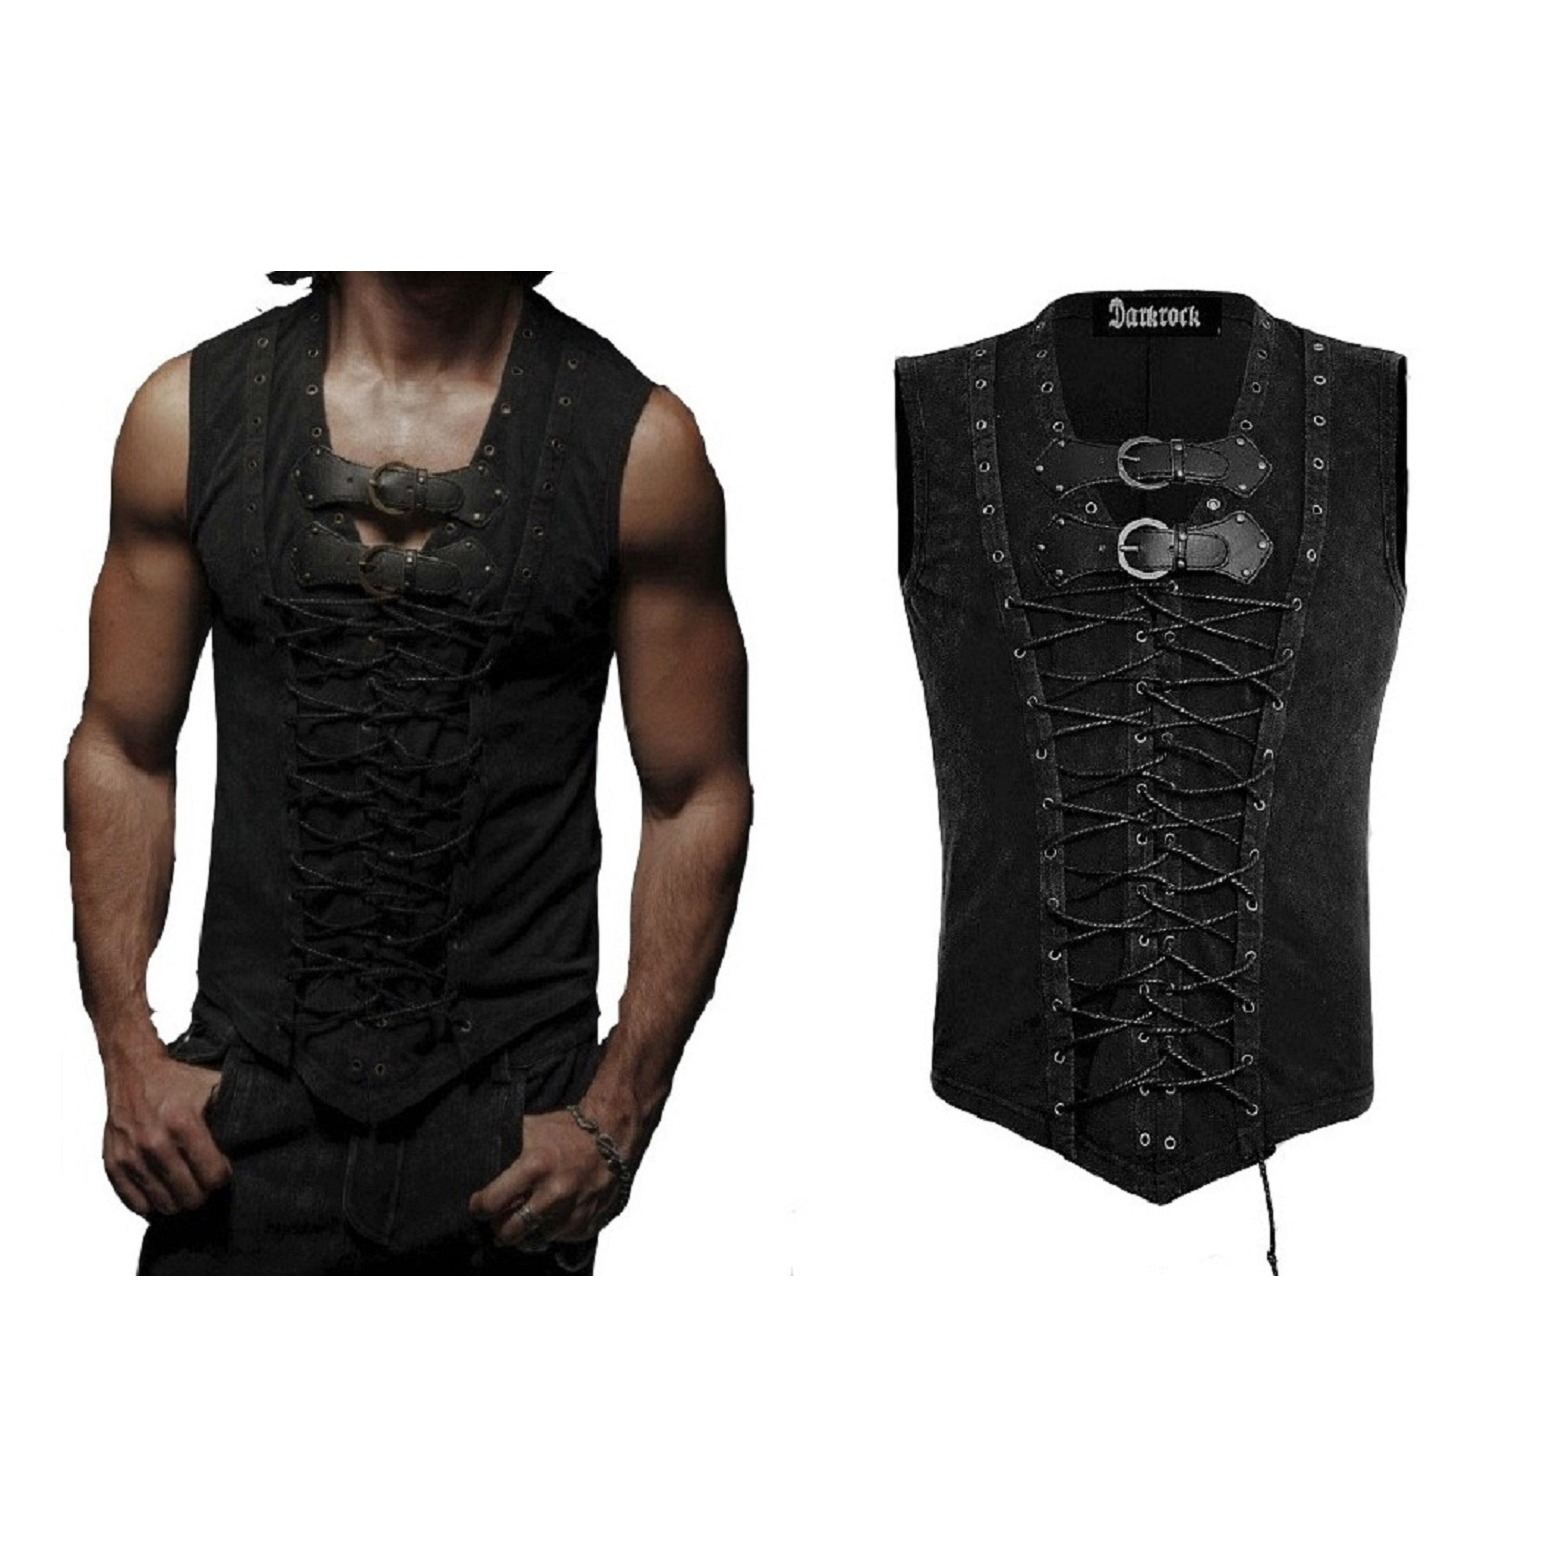 Vintage Men T-Shirt Steampunk Gothic visual kei Vest (1)